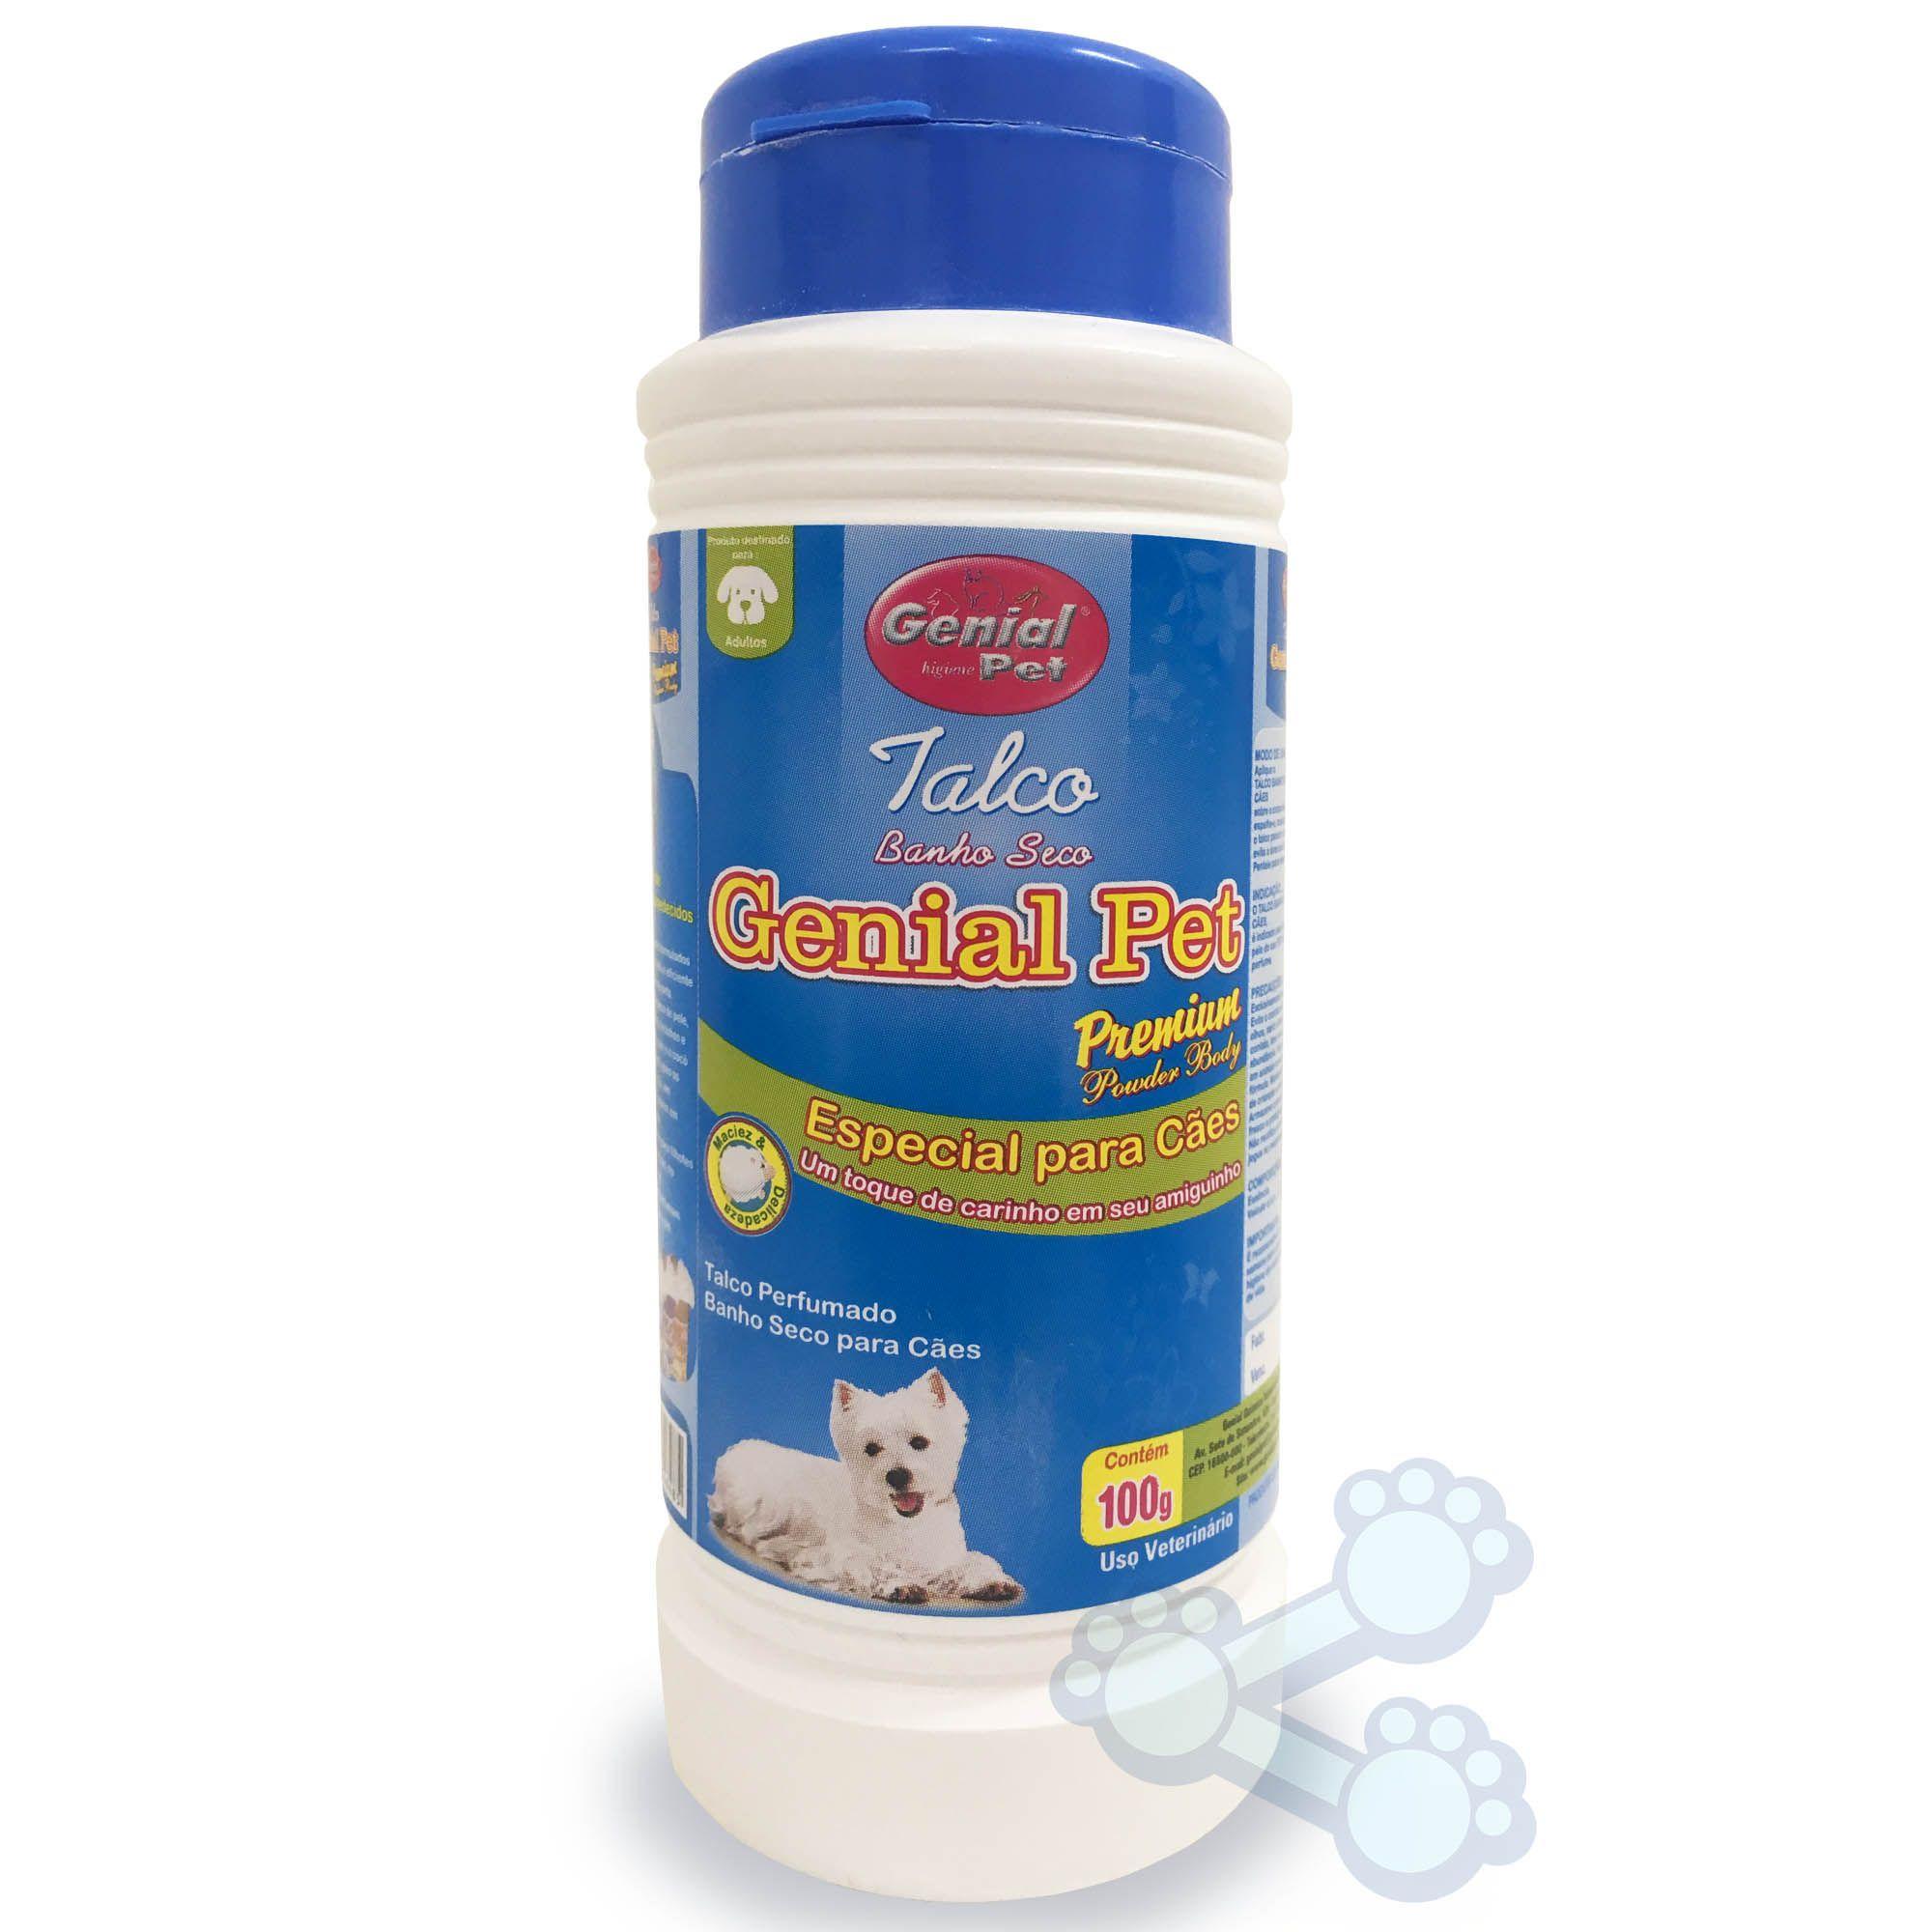 Talco Banho Seco Genial Cães 100g